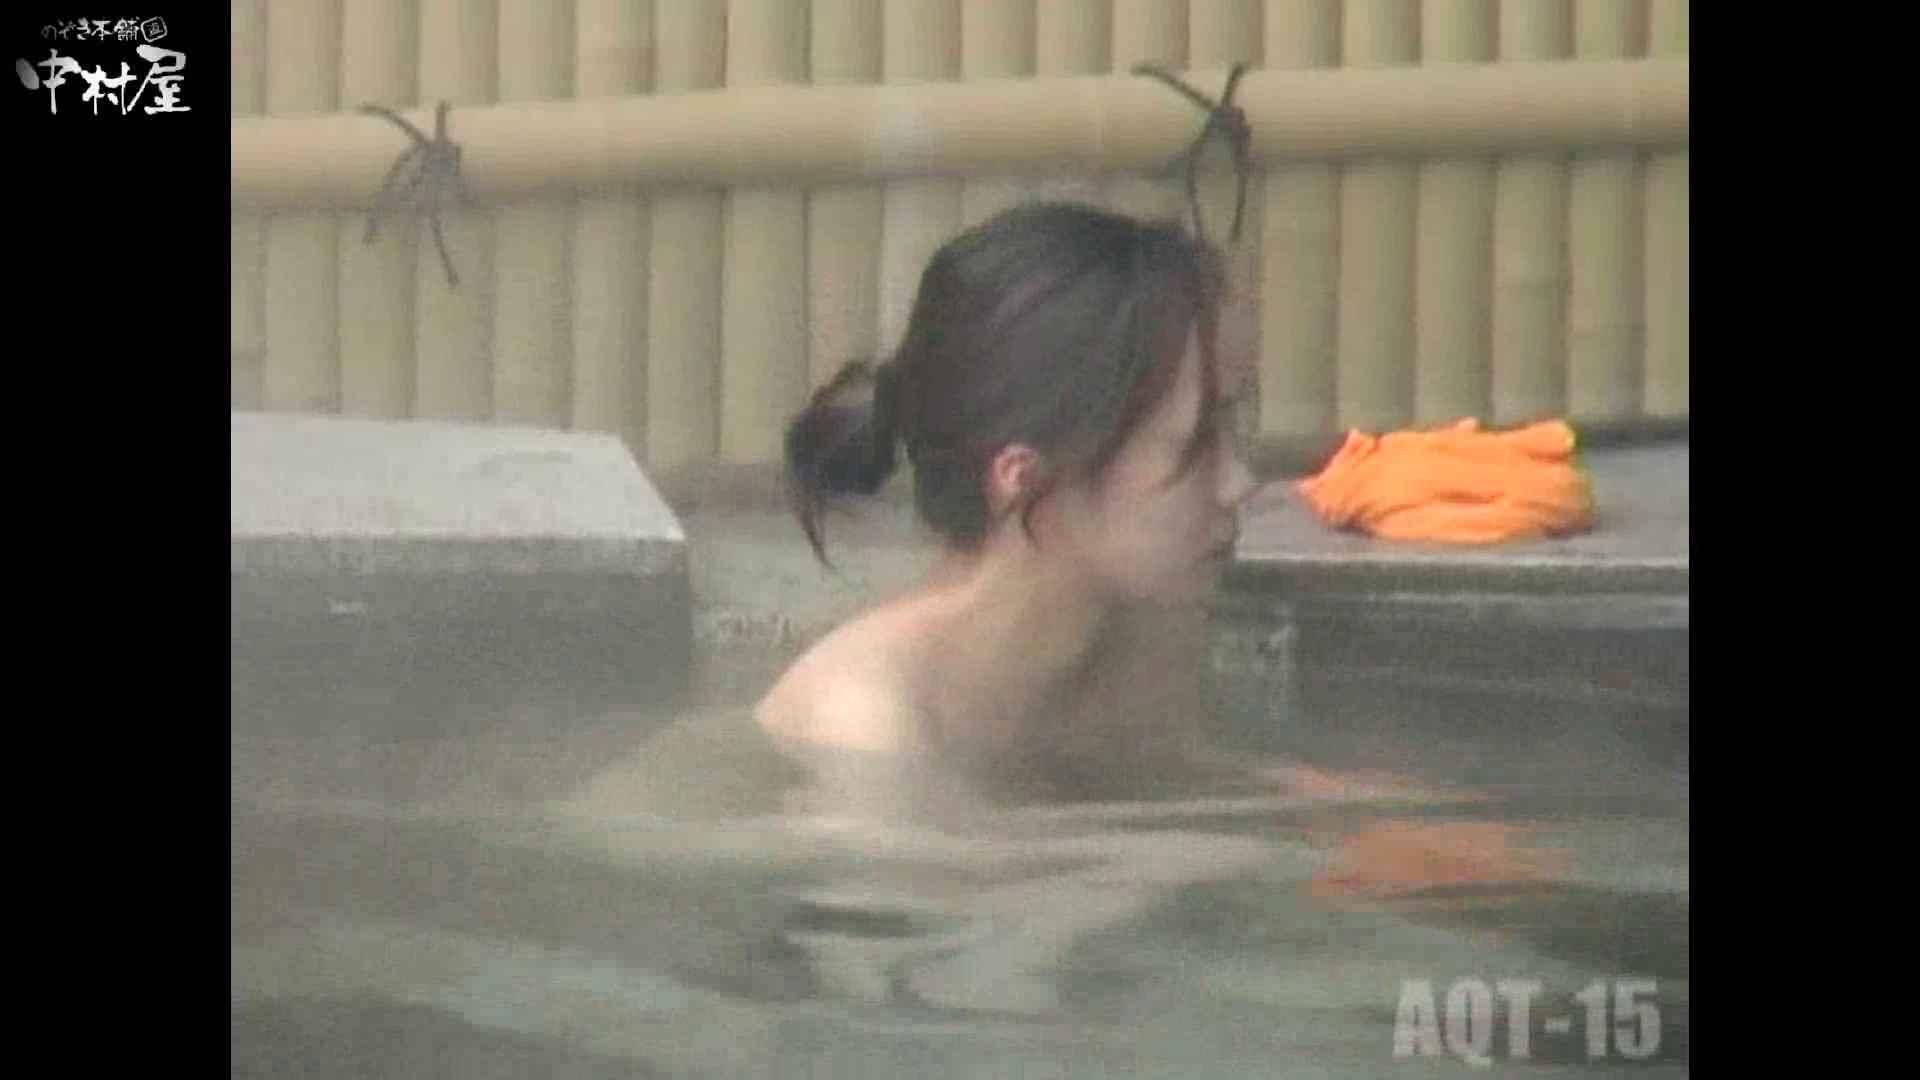 Aquaな露天風呂Vol.878潜入盗撮露天風呂十五判湯 其の八 潜入  70枚 60